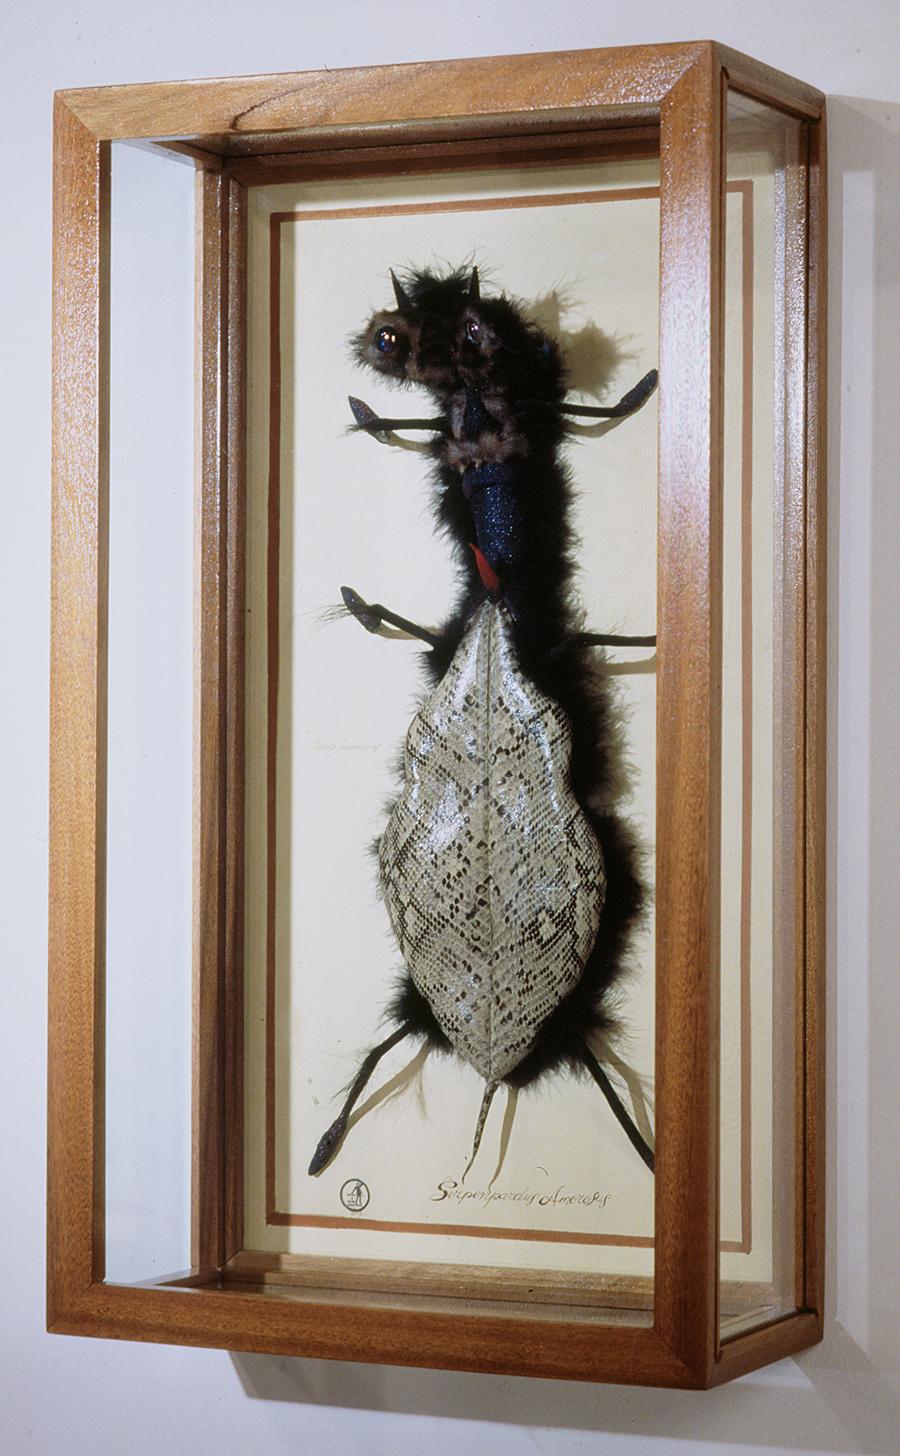 Serpenpardus Amorosus